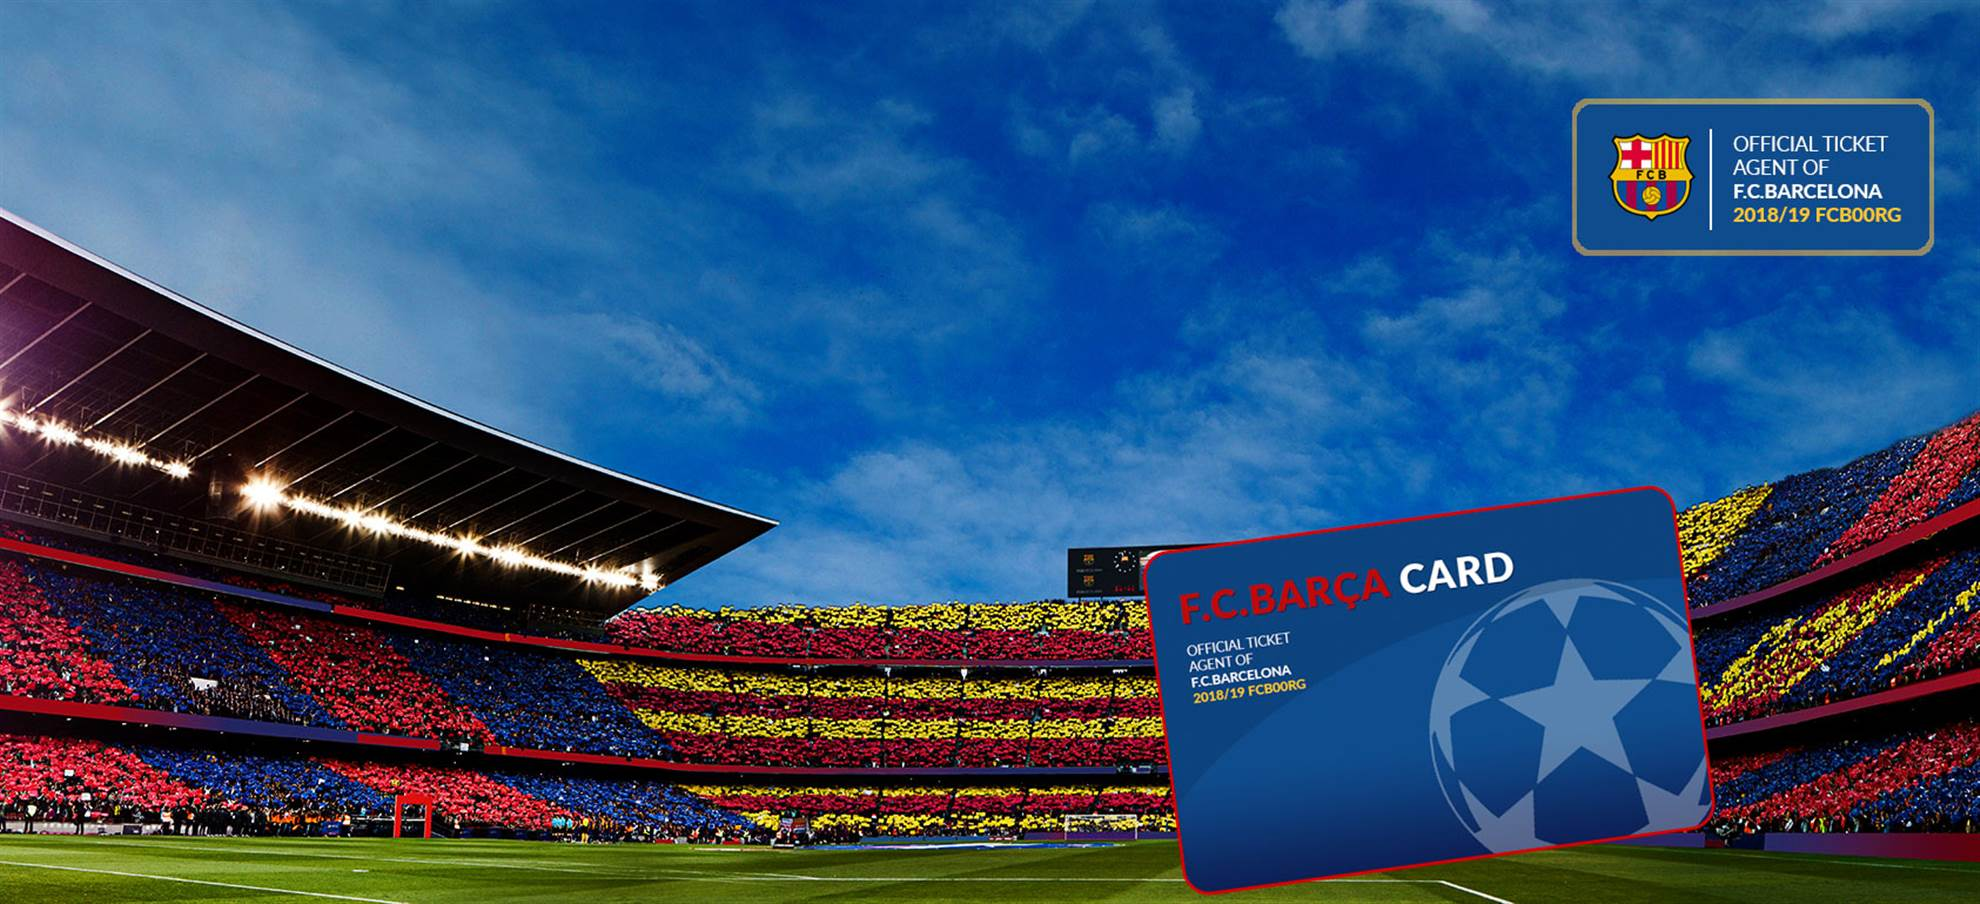 La carte Barça